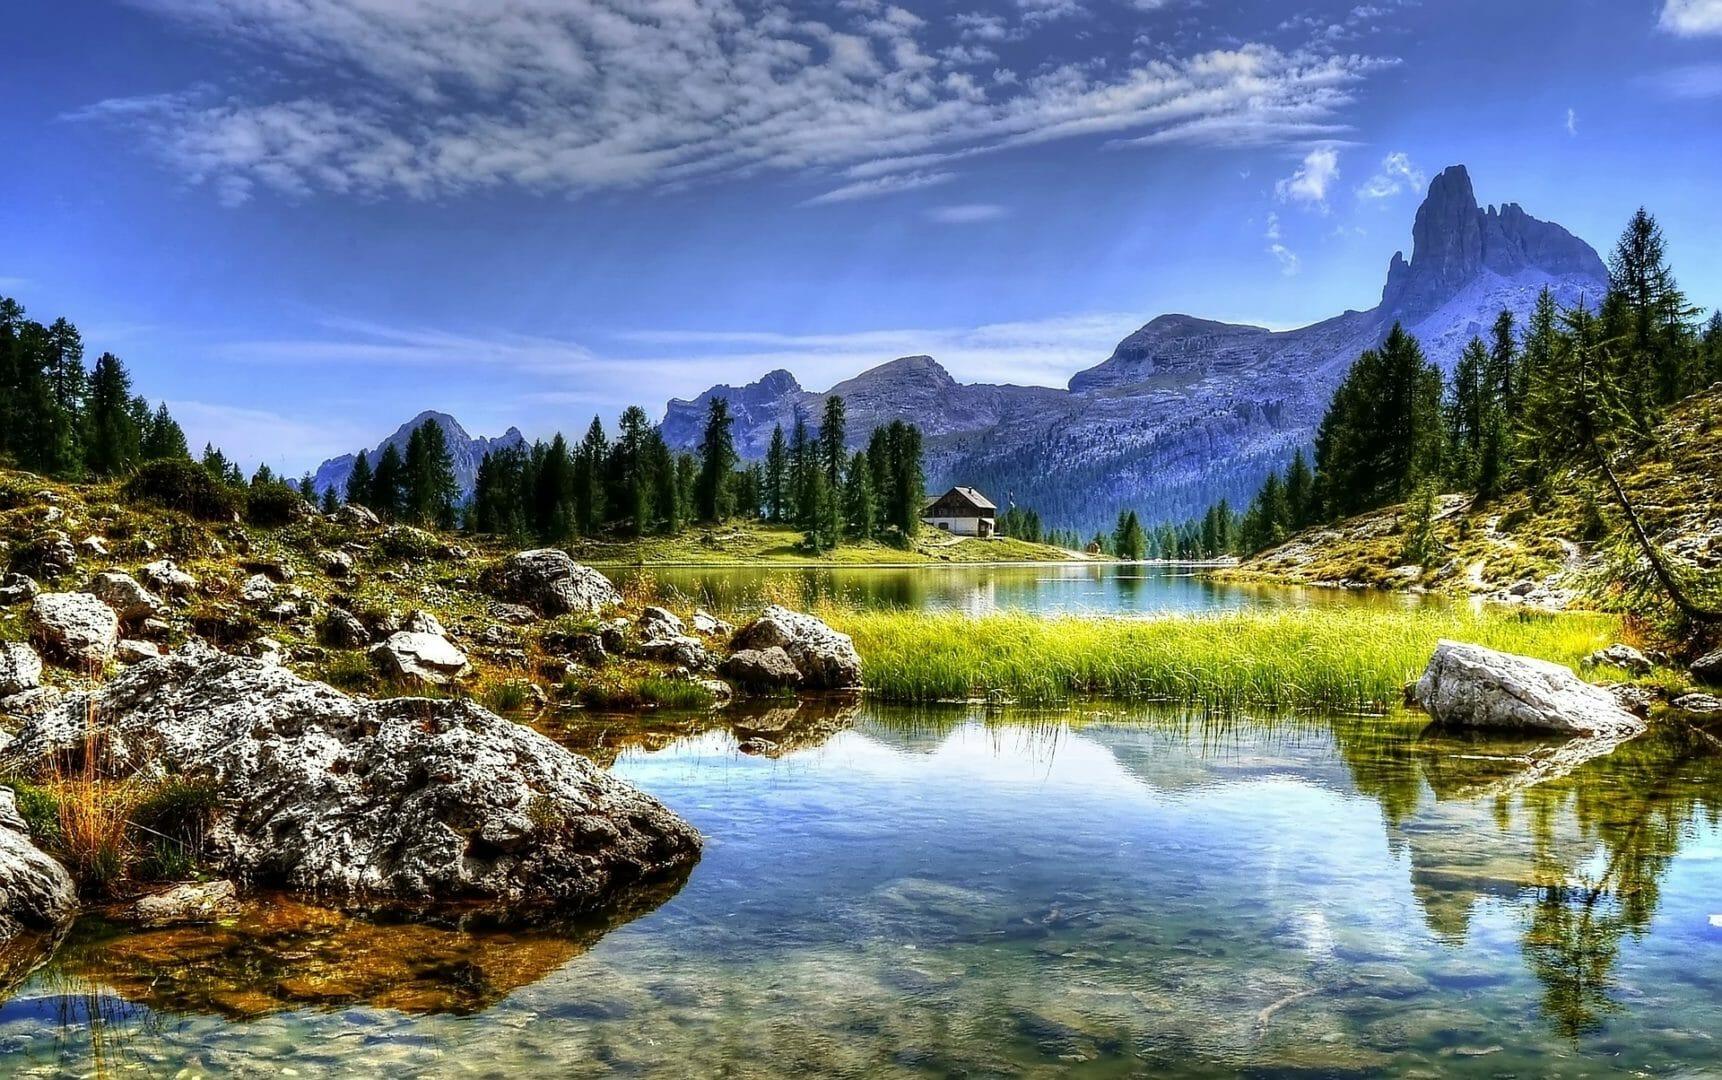 Montagnes Dolomites - Voyager sans avion